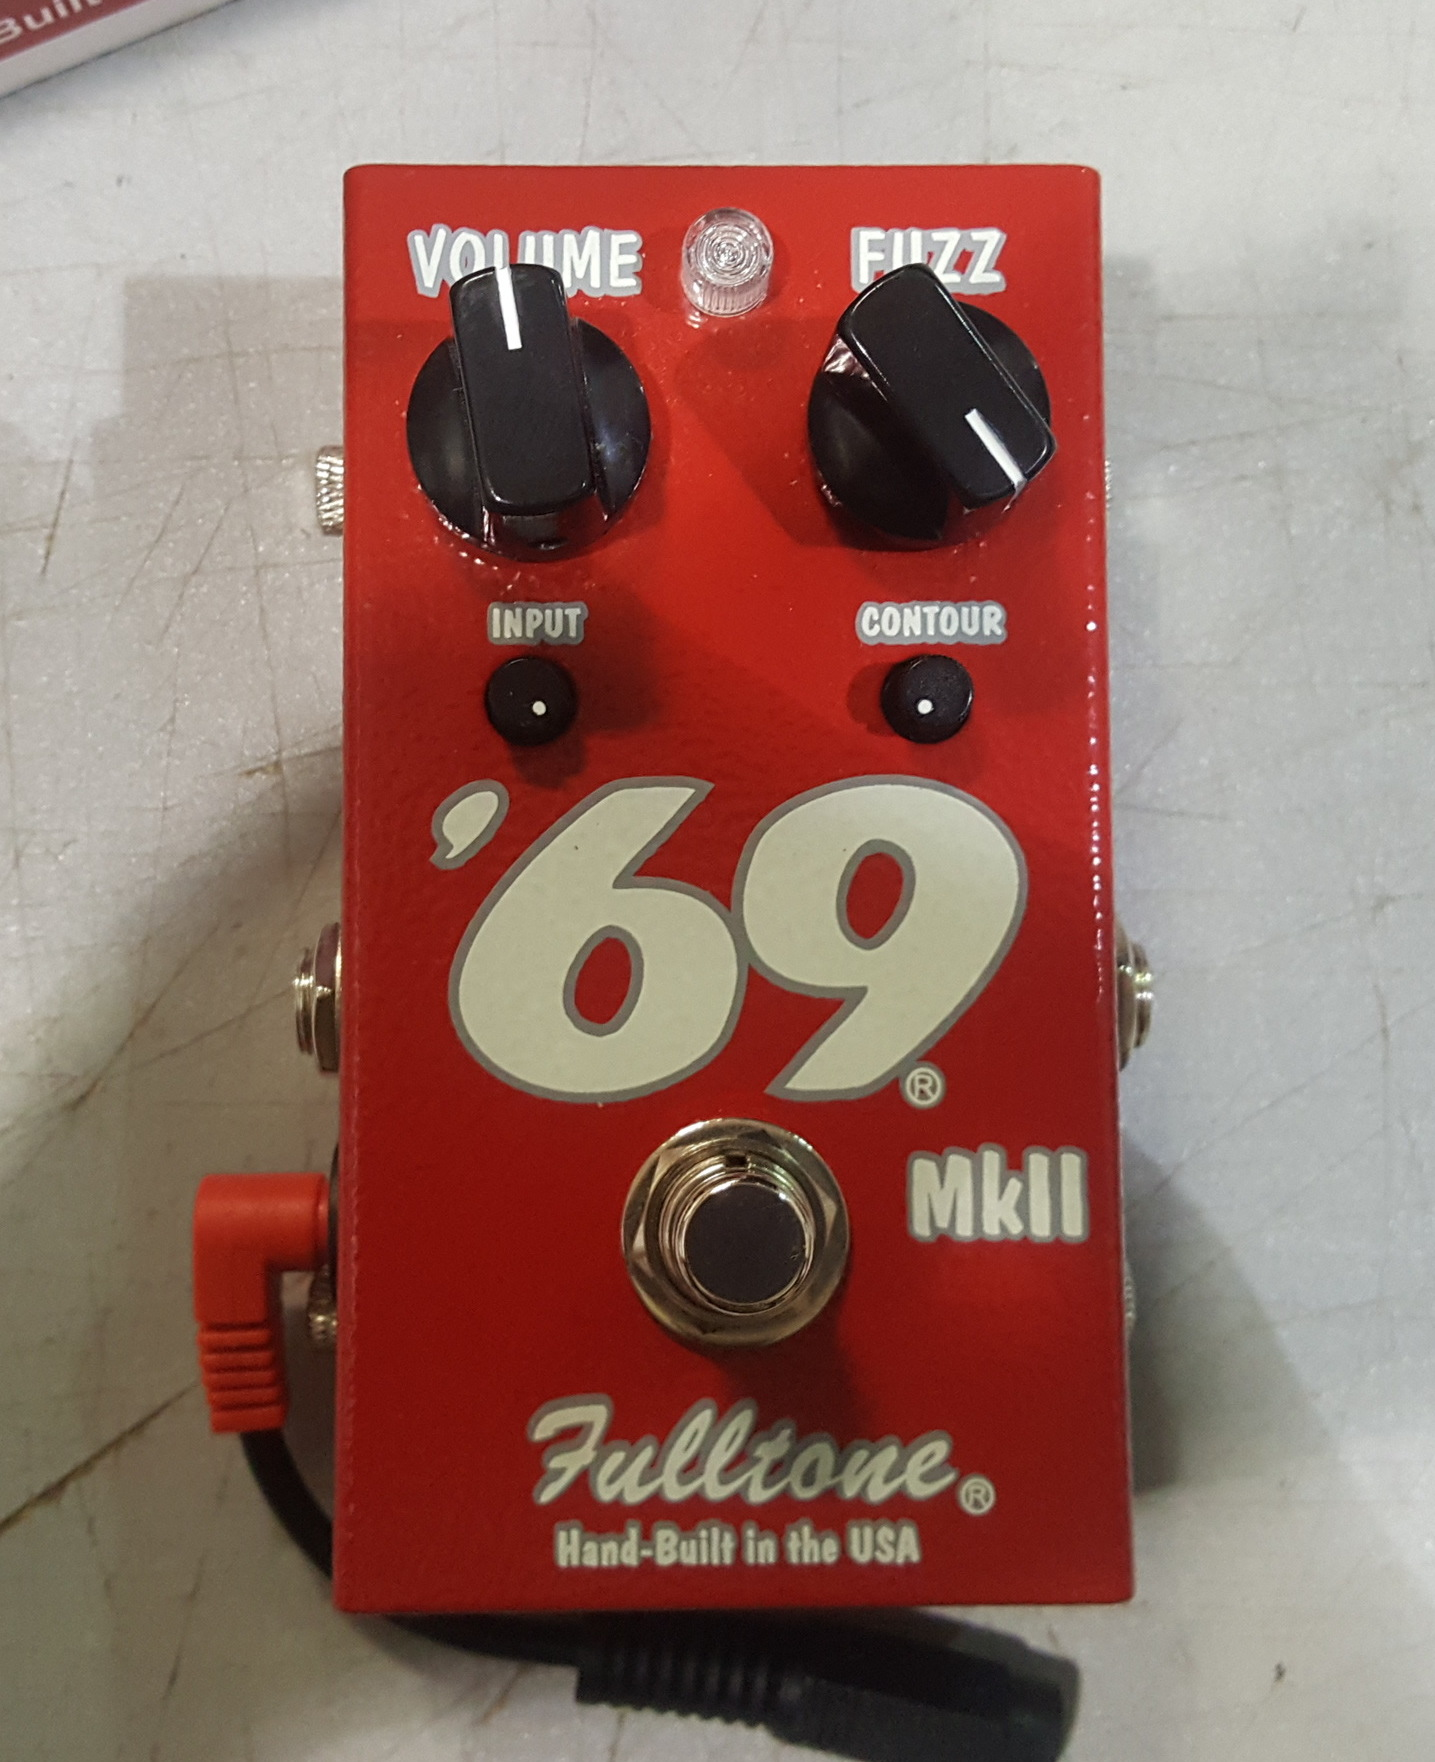 FULLTONE '69 FUZZ MkII Guitar Effects FX Pedal